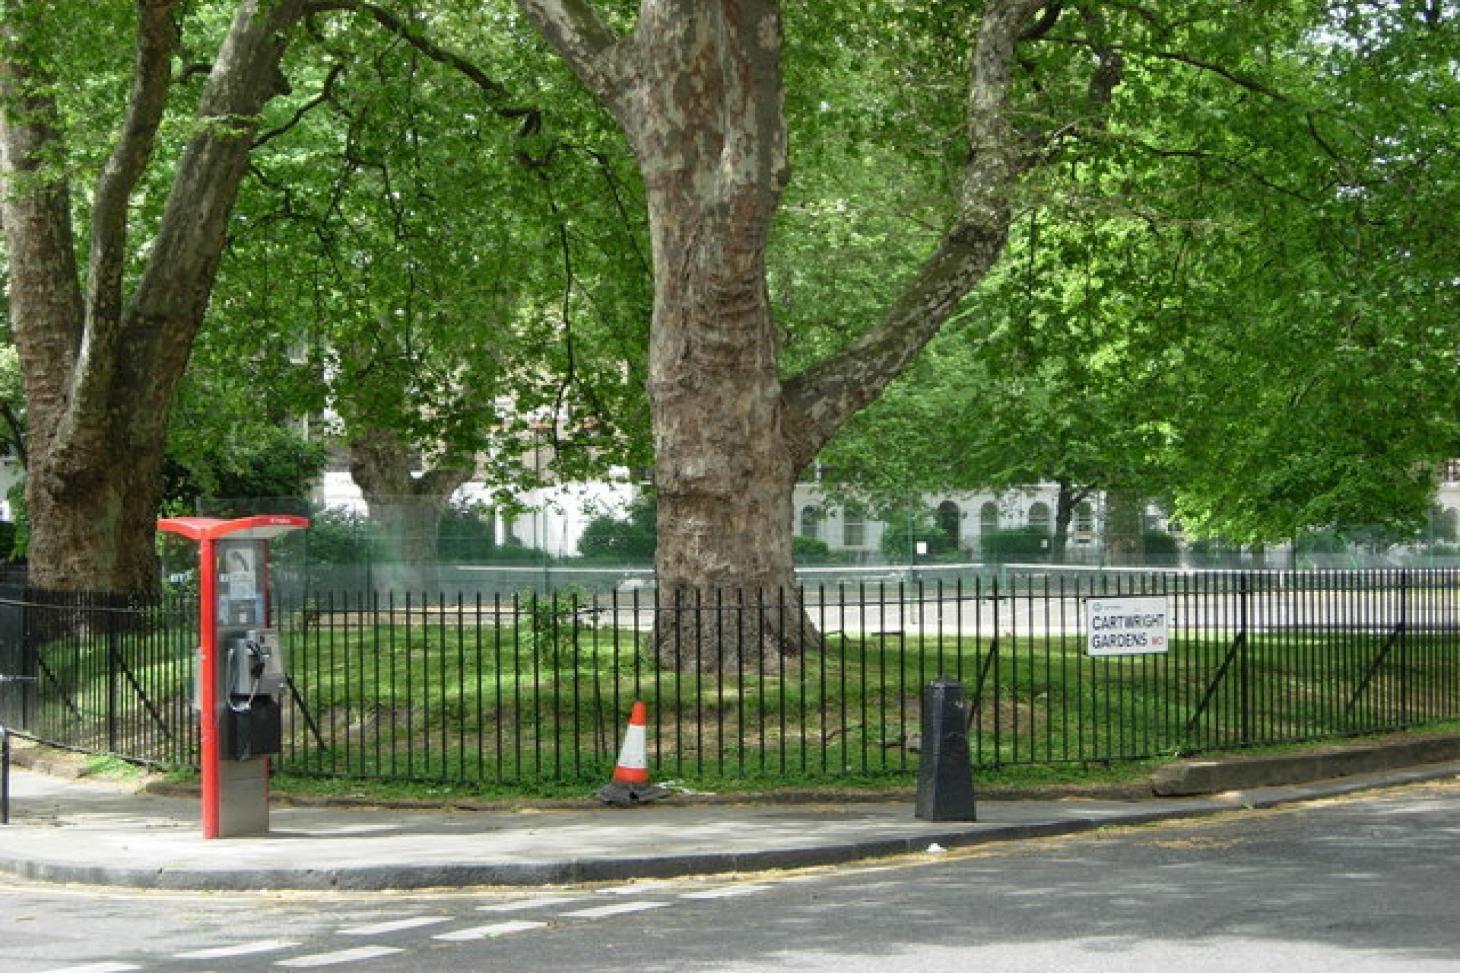 Cartwright Gardens Outdoor | Hard (macadam) tennis court